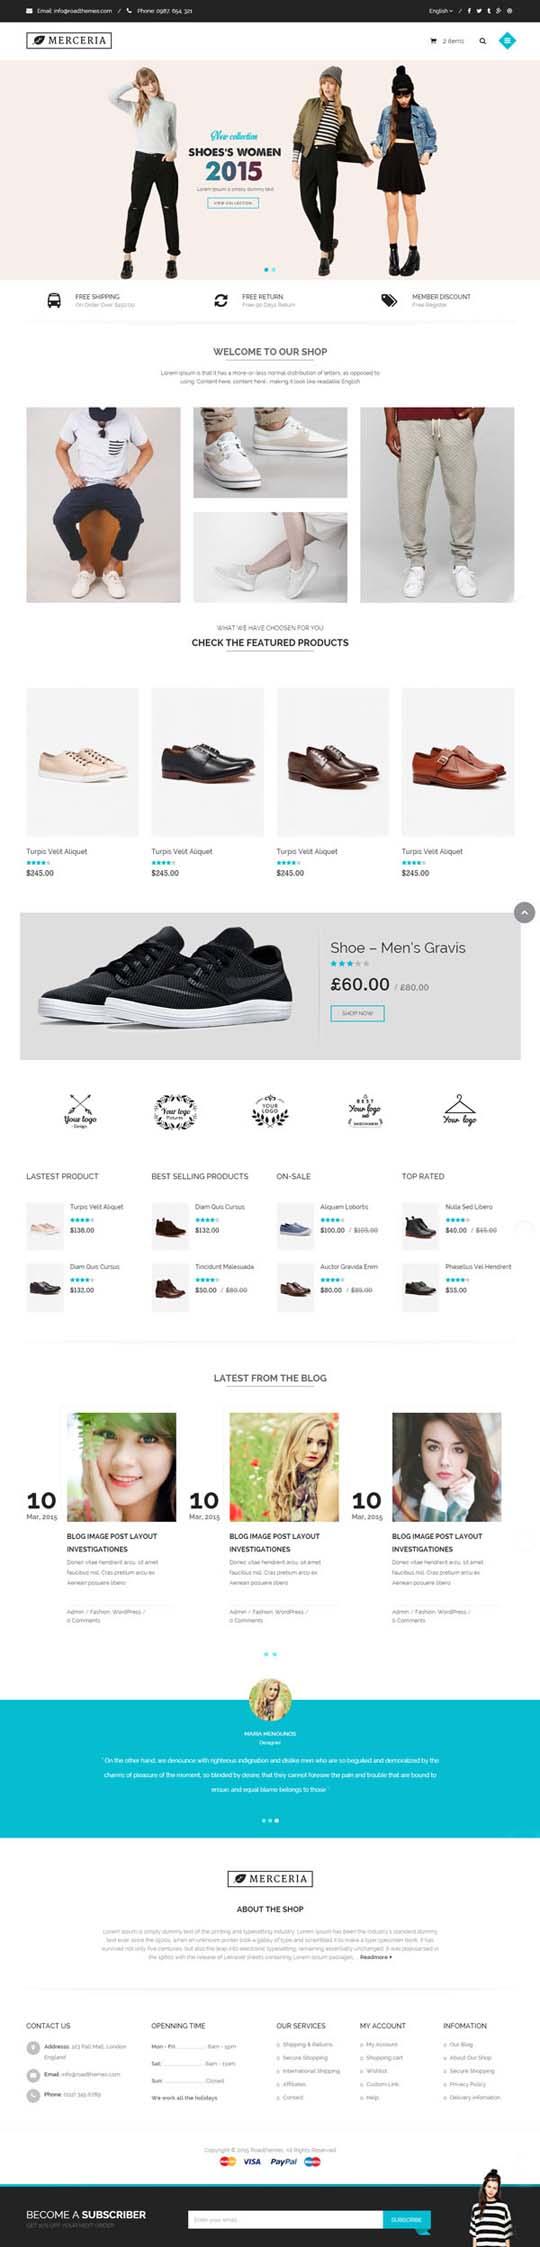 9.Responsive Design HTML5 Website Templates